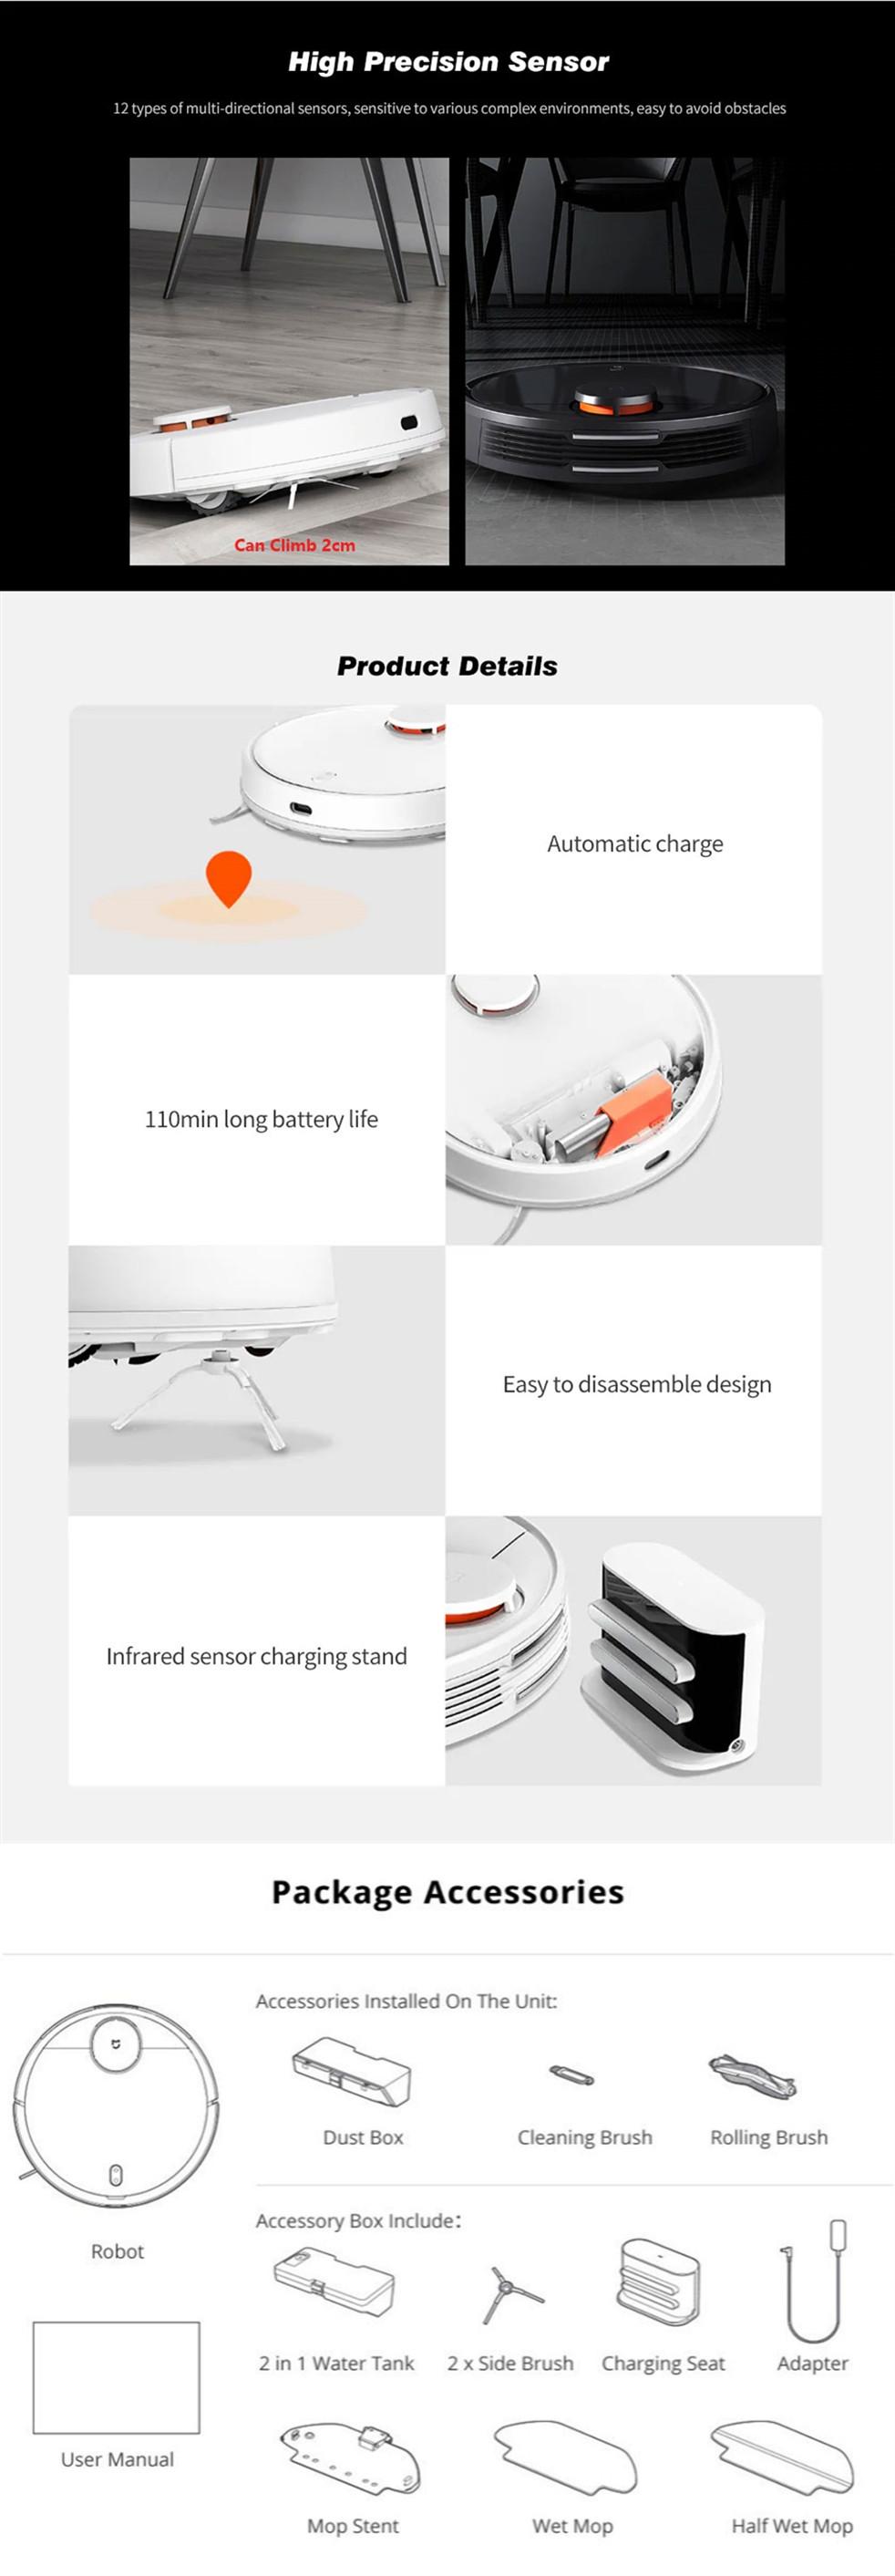 Xiaomi Mijia STYJ02YM 2 in 1 Sweeping Mopping Robot Vacuum Cleaner - Black